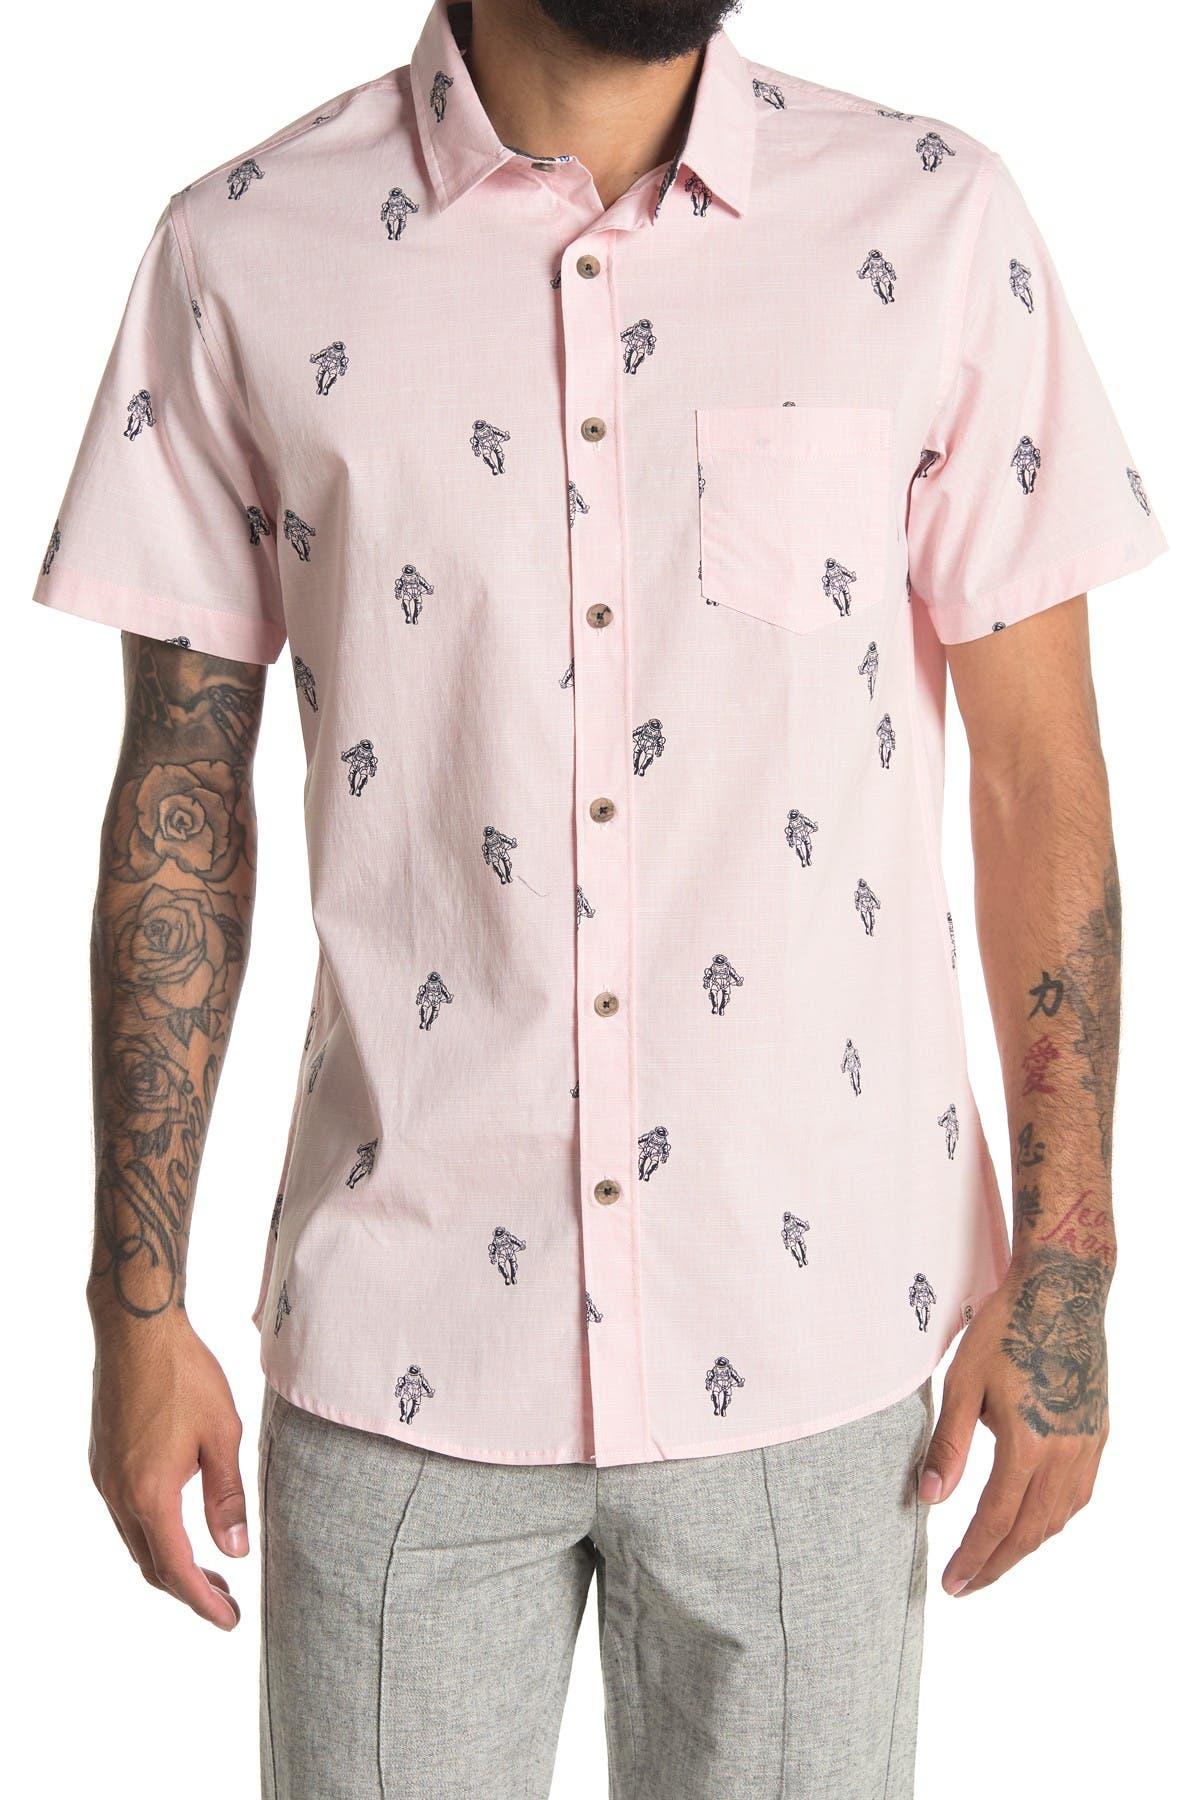 Image of Sovereign Code Whiteside Short Sleeve Button Down Shirt